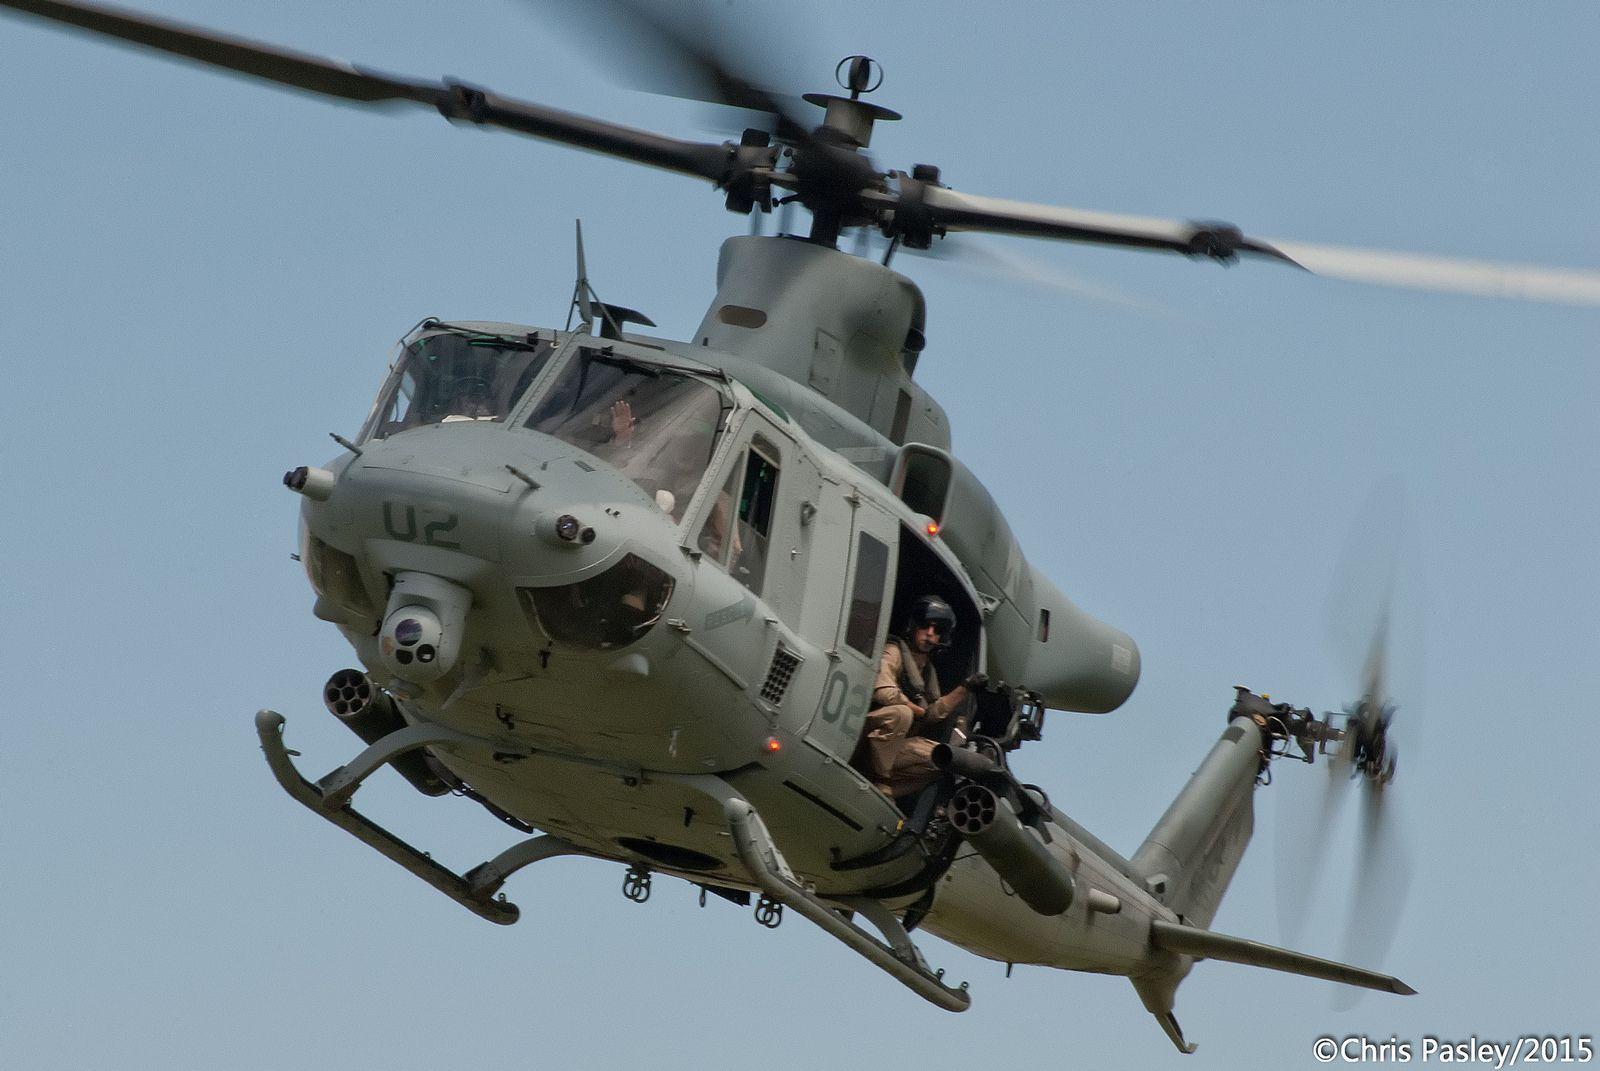 UH-1Y Venom HMLA-169 BuNo 168951 -  UH-1Y Venom HMLA-169 BuNo 168551  - #BuNo #helicopterluxury #helicoptermilitary #helicopterprivate #HMLA169 #UH1Y #Venom